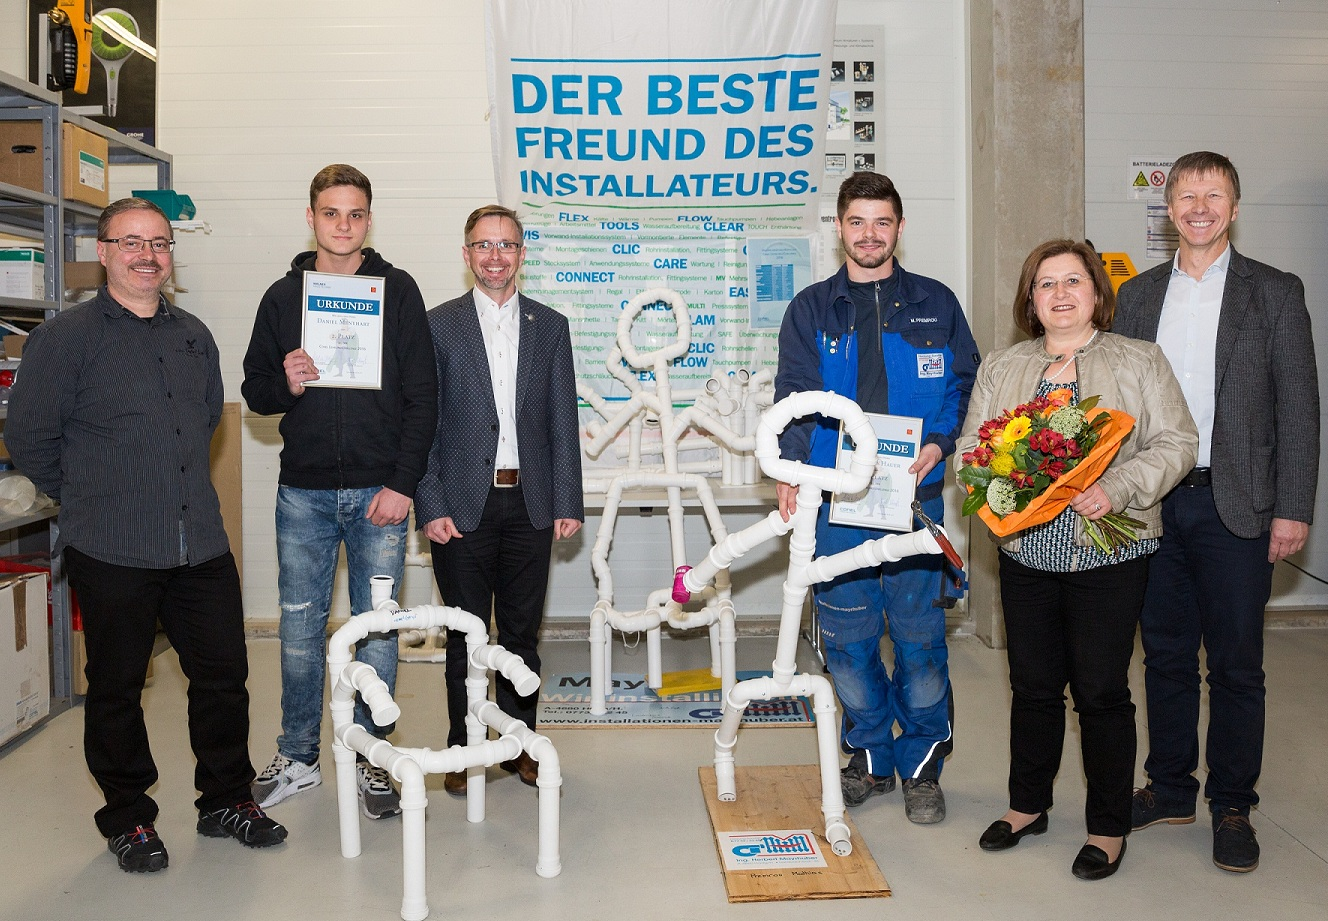 (v.l.): Josef Hemetsberger (Firma Hemetsberger), Daniel Menyhart (2. Platz), Herbert Aichinger (phg Wagner Haustechnik), Mathias Premrou (1. Platz), Andrea Betz (Jurymitglied), Robert Schimpf (Installationsverantwortlicher Wagner Haustechnik).